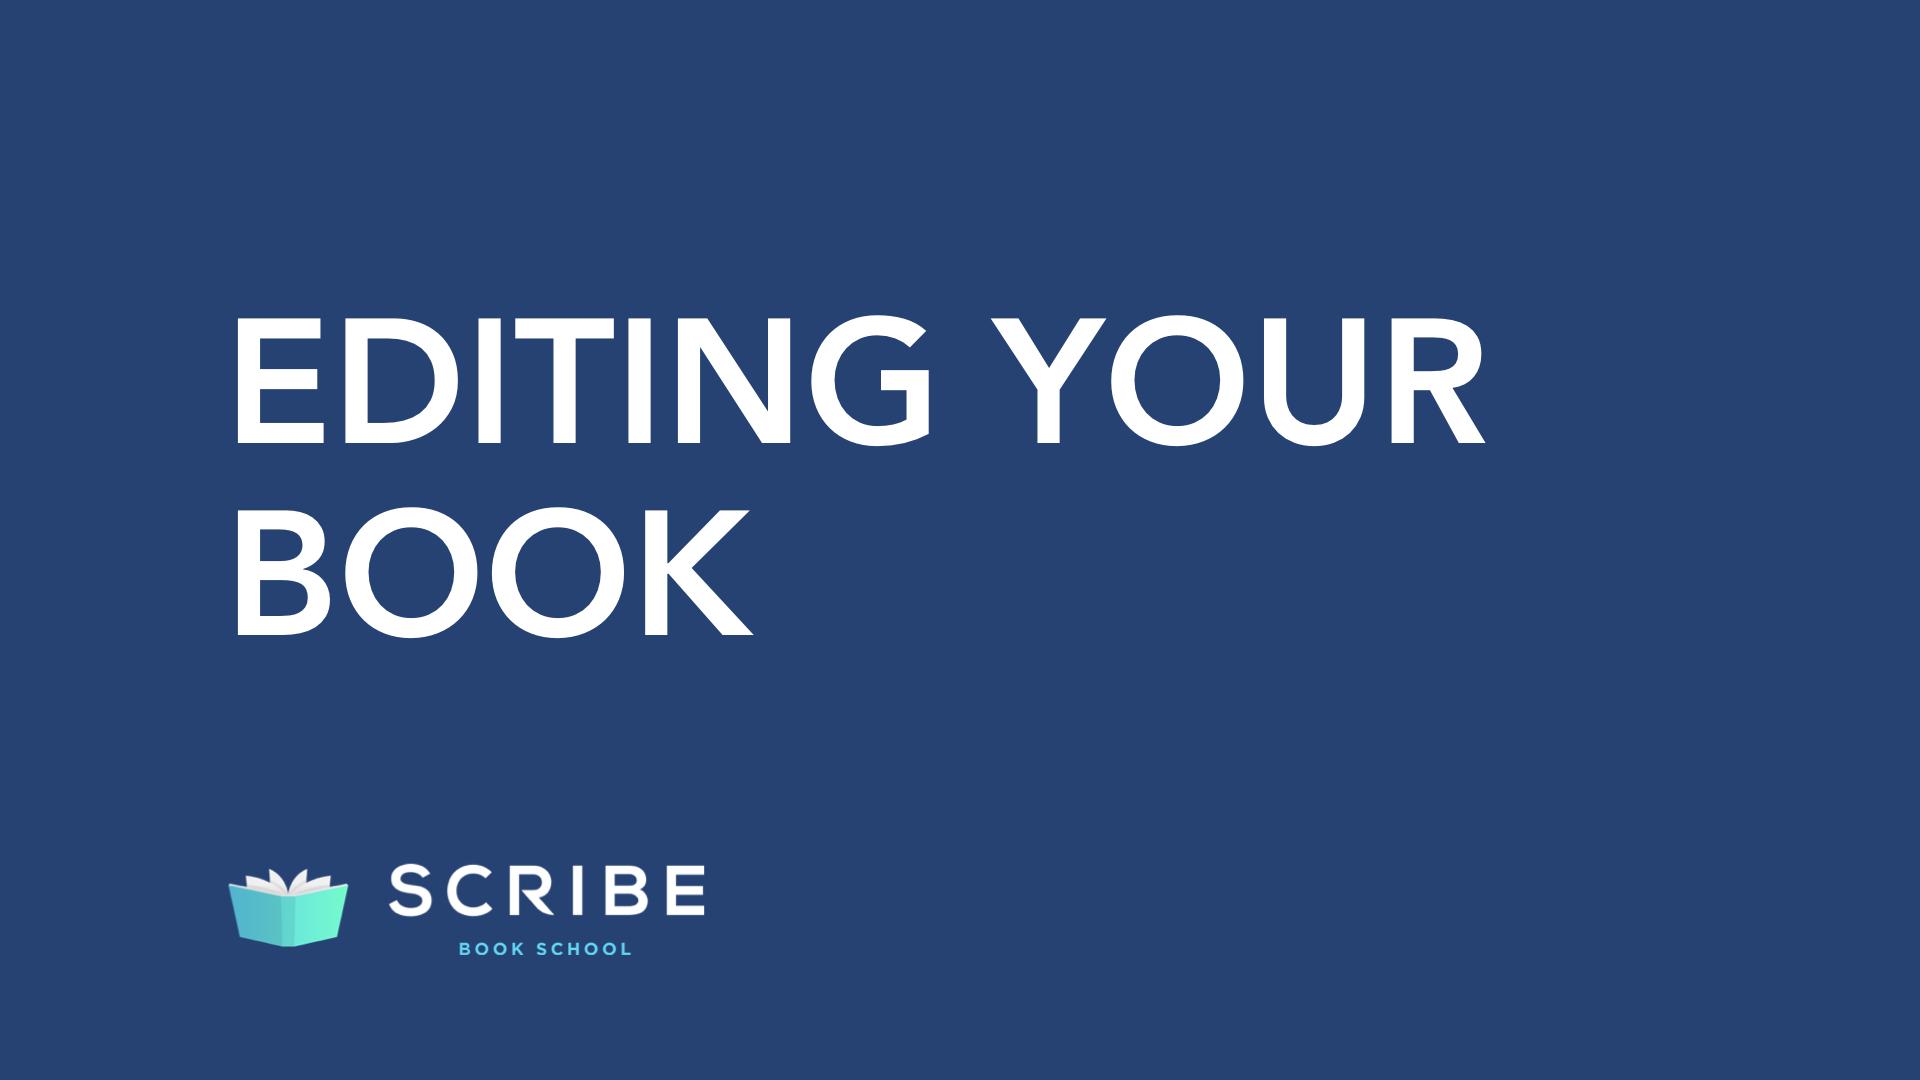 scribe book school editing your book